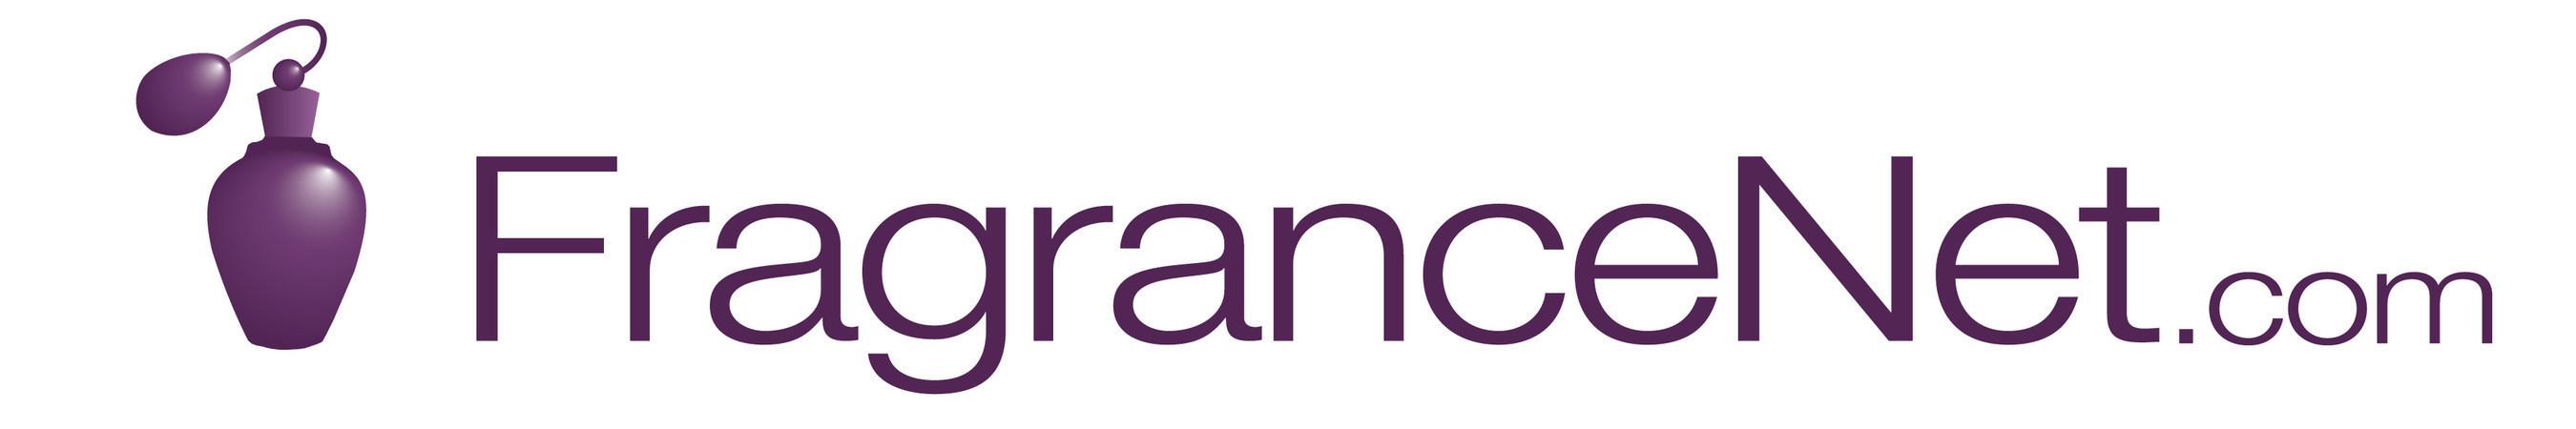 Leading E-Retailer FragranceNet.com Kicks Off 2015 with Major Brand Milestones